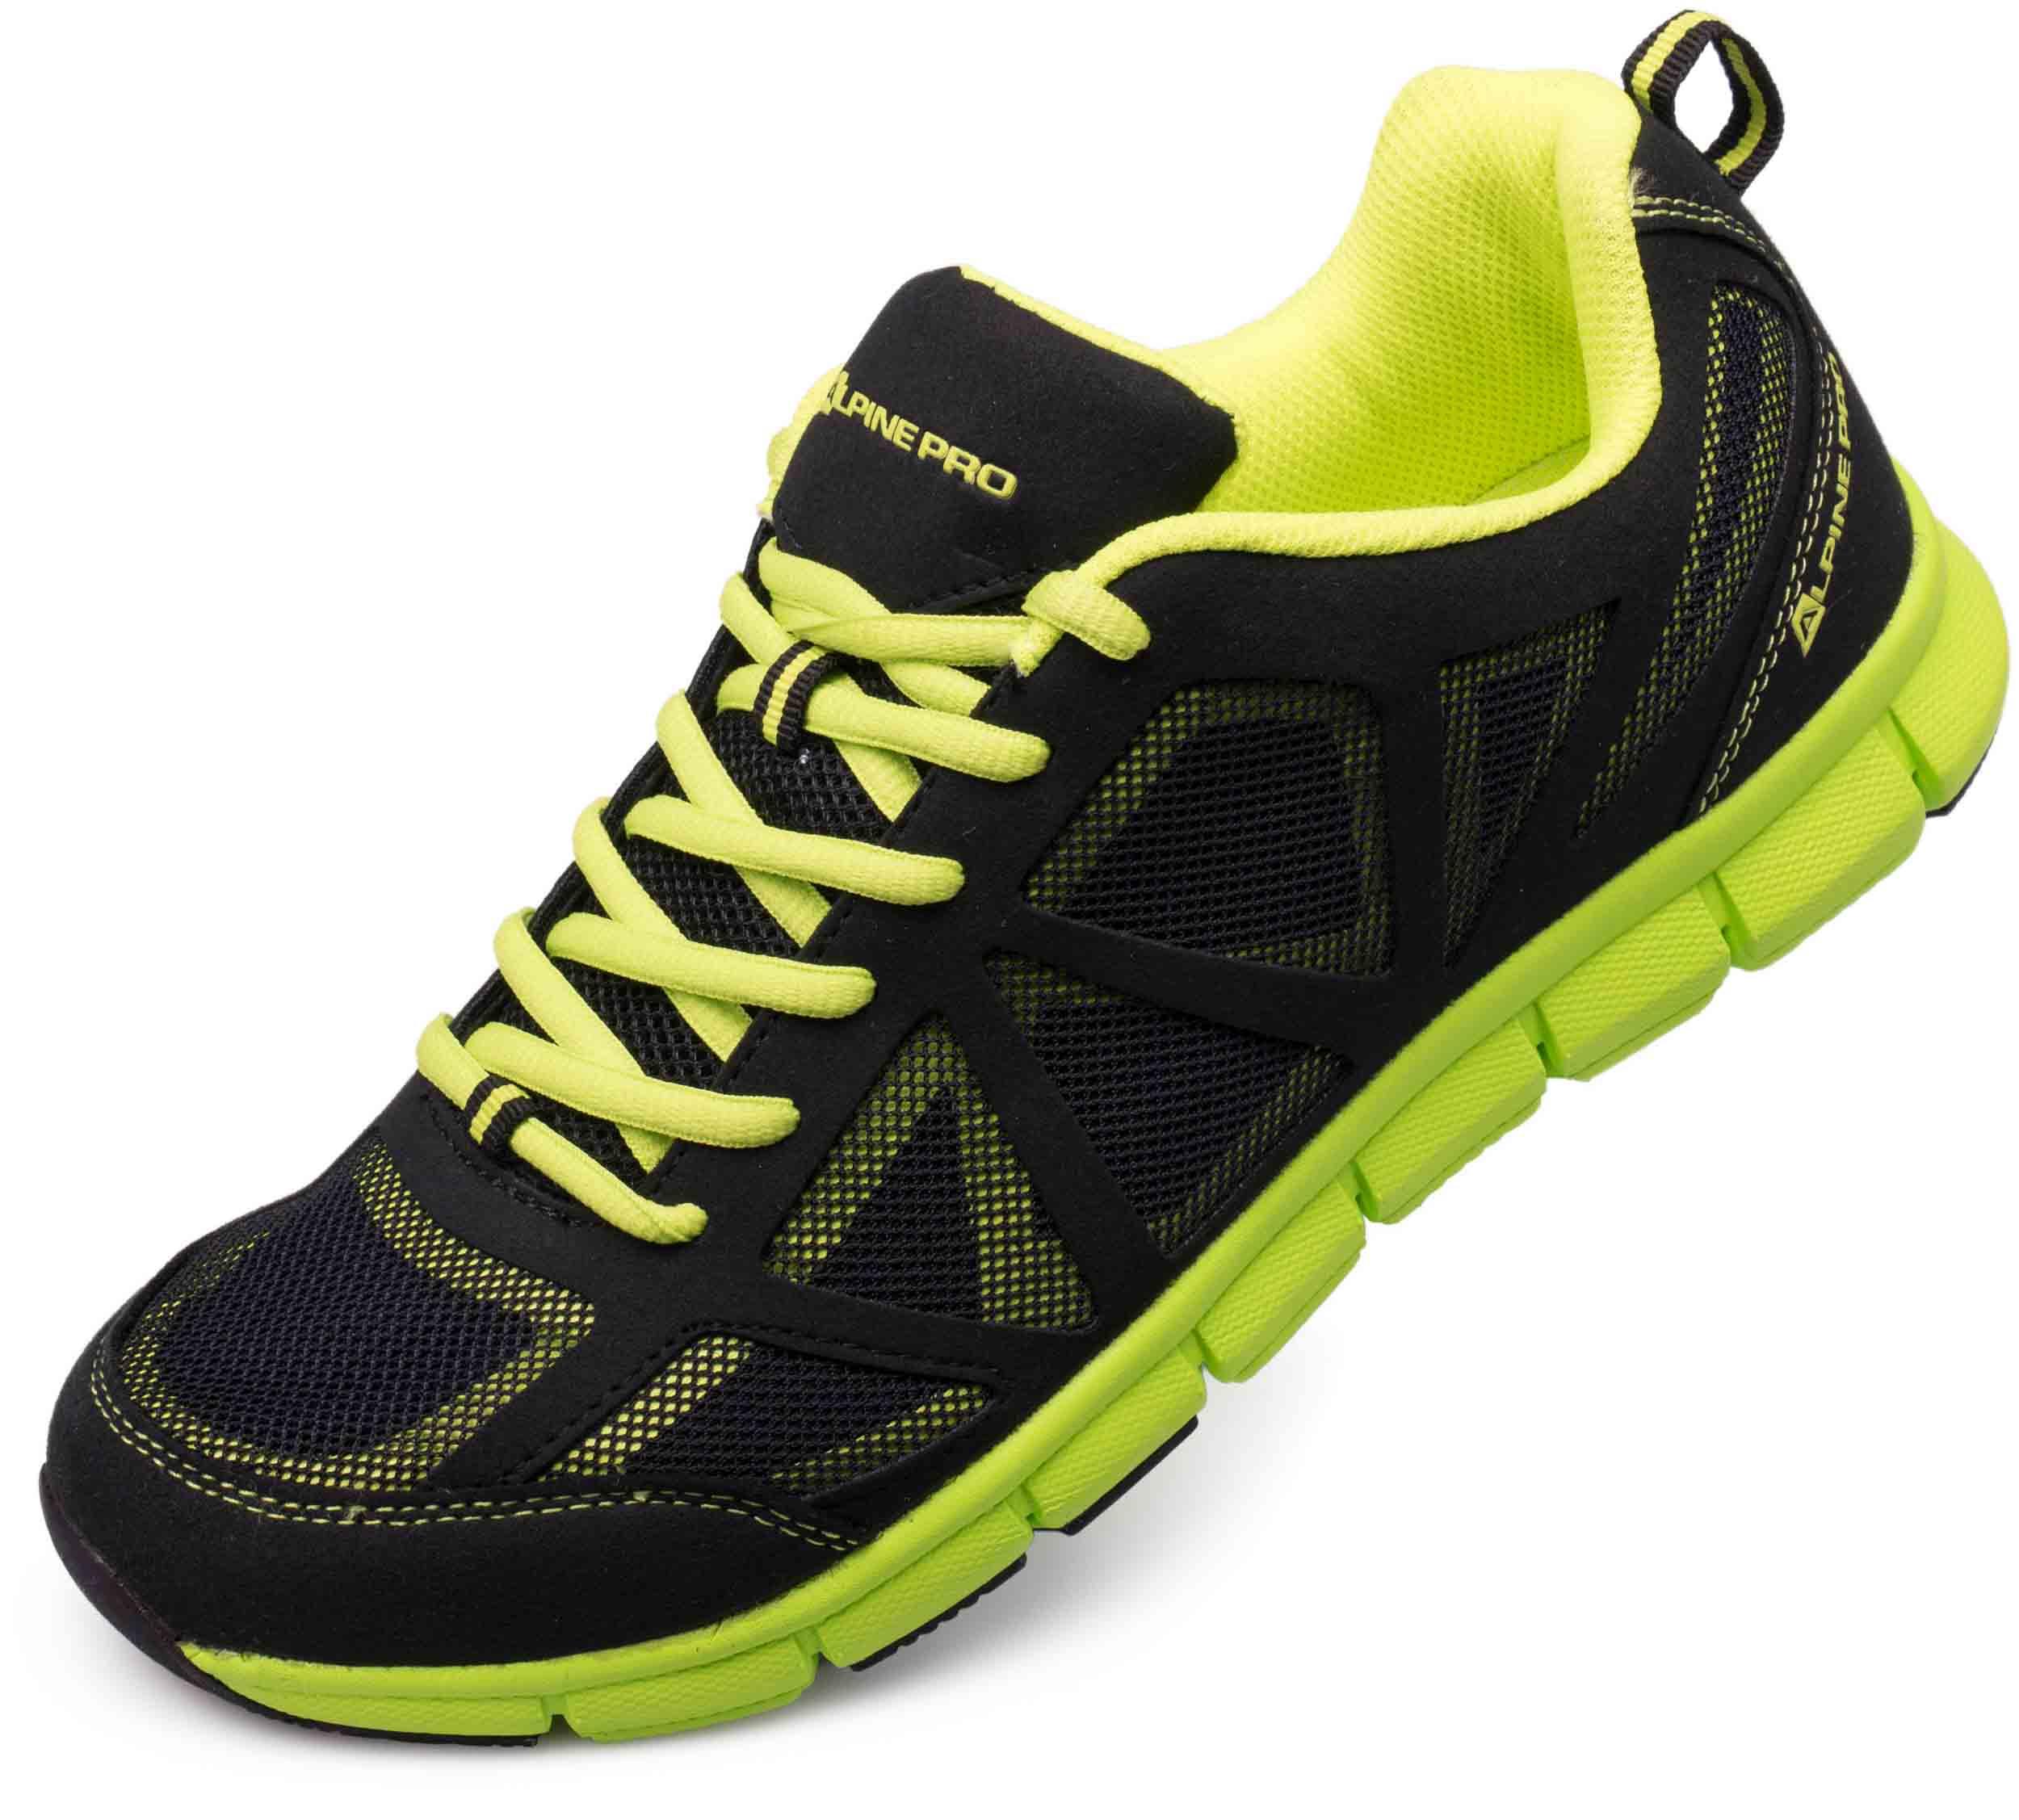 Běžecké boty Alpine Pro Oberon|EUR 37